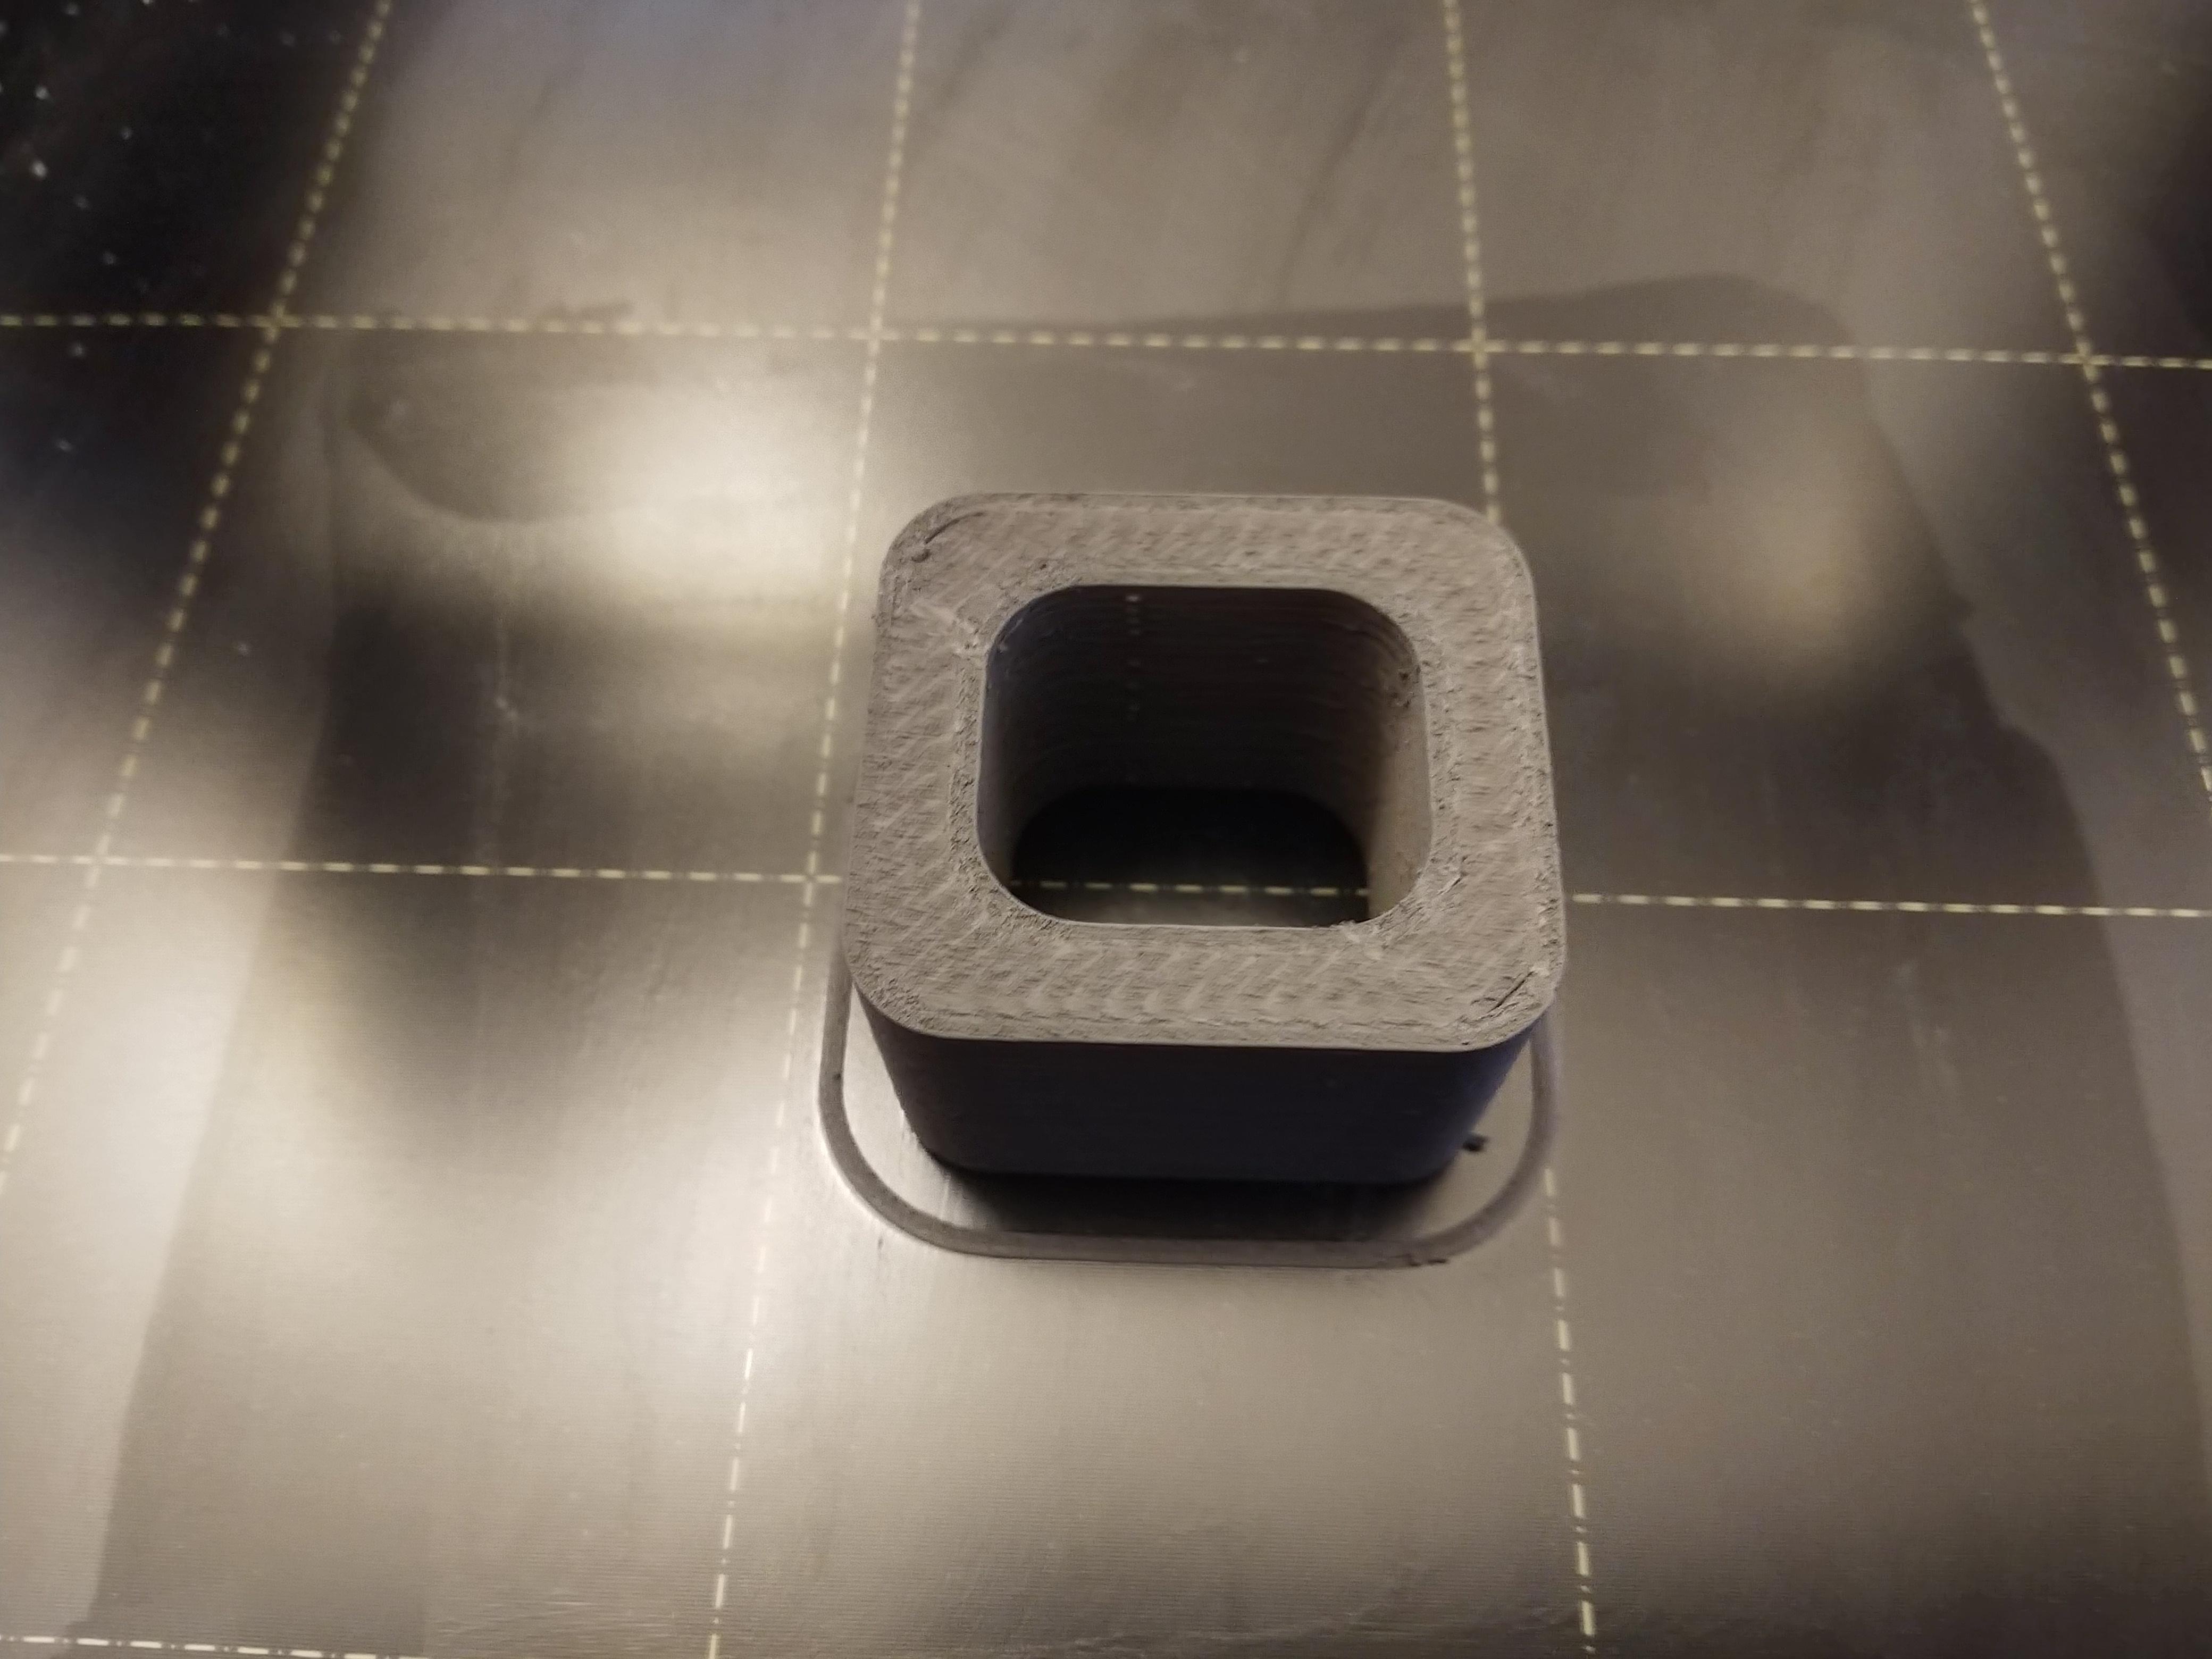 Stainless Steel 316L filament by Metallum3D, 3D printed on an FDM/FFF machine. Image via Metallum3D.